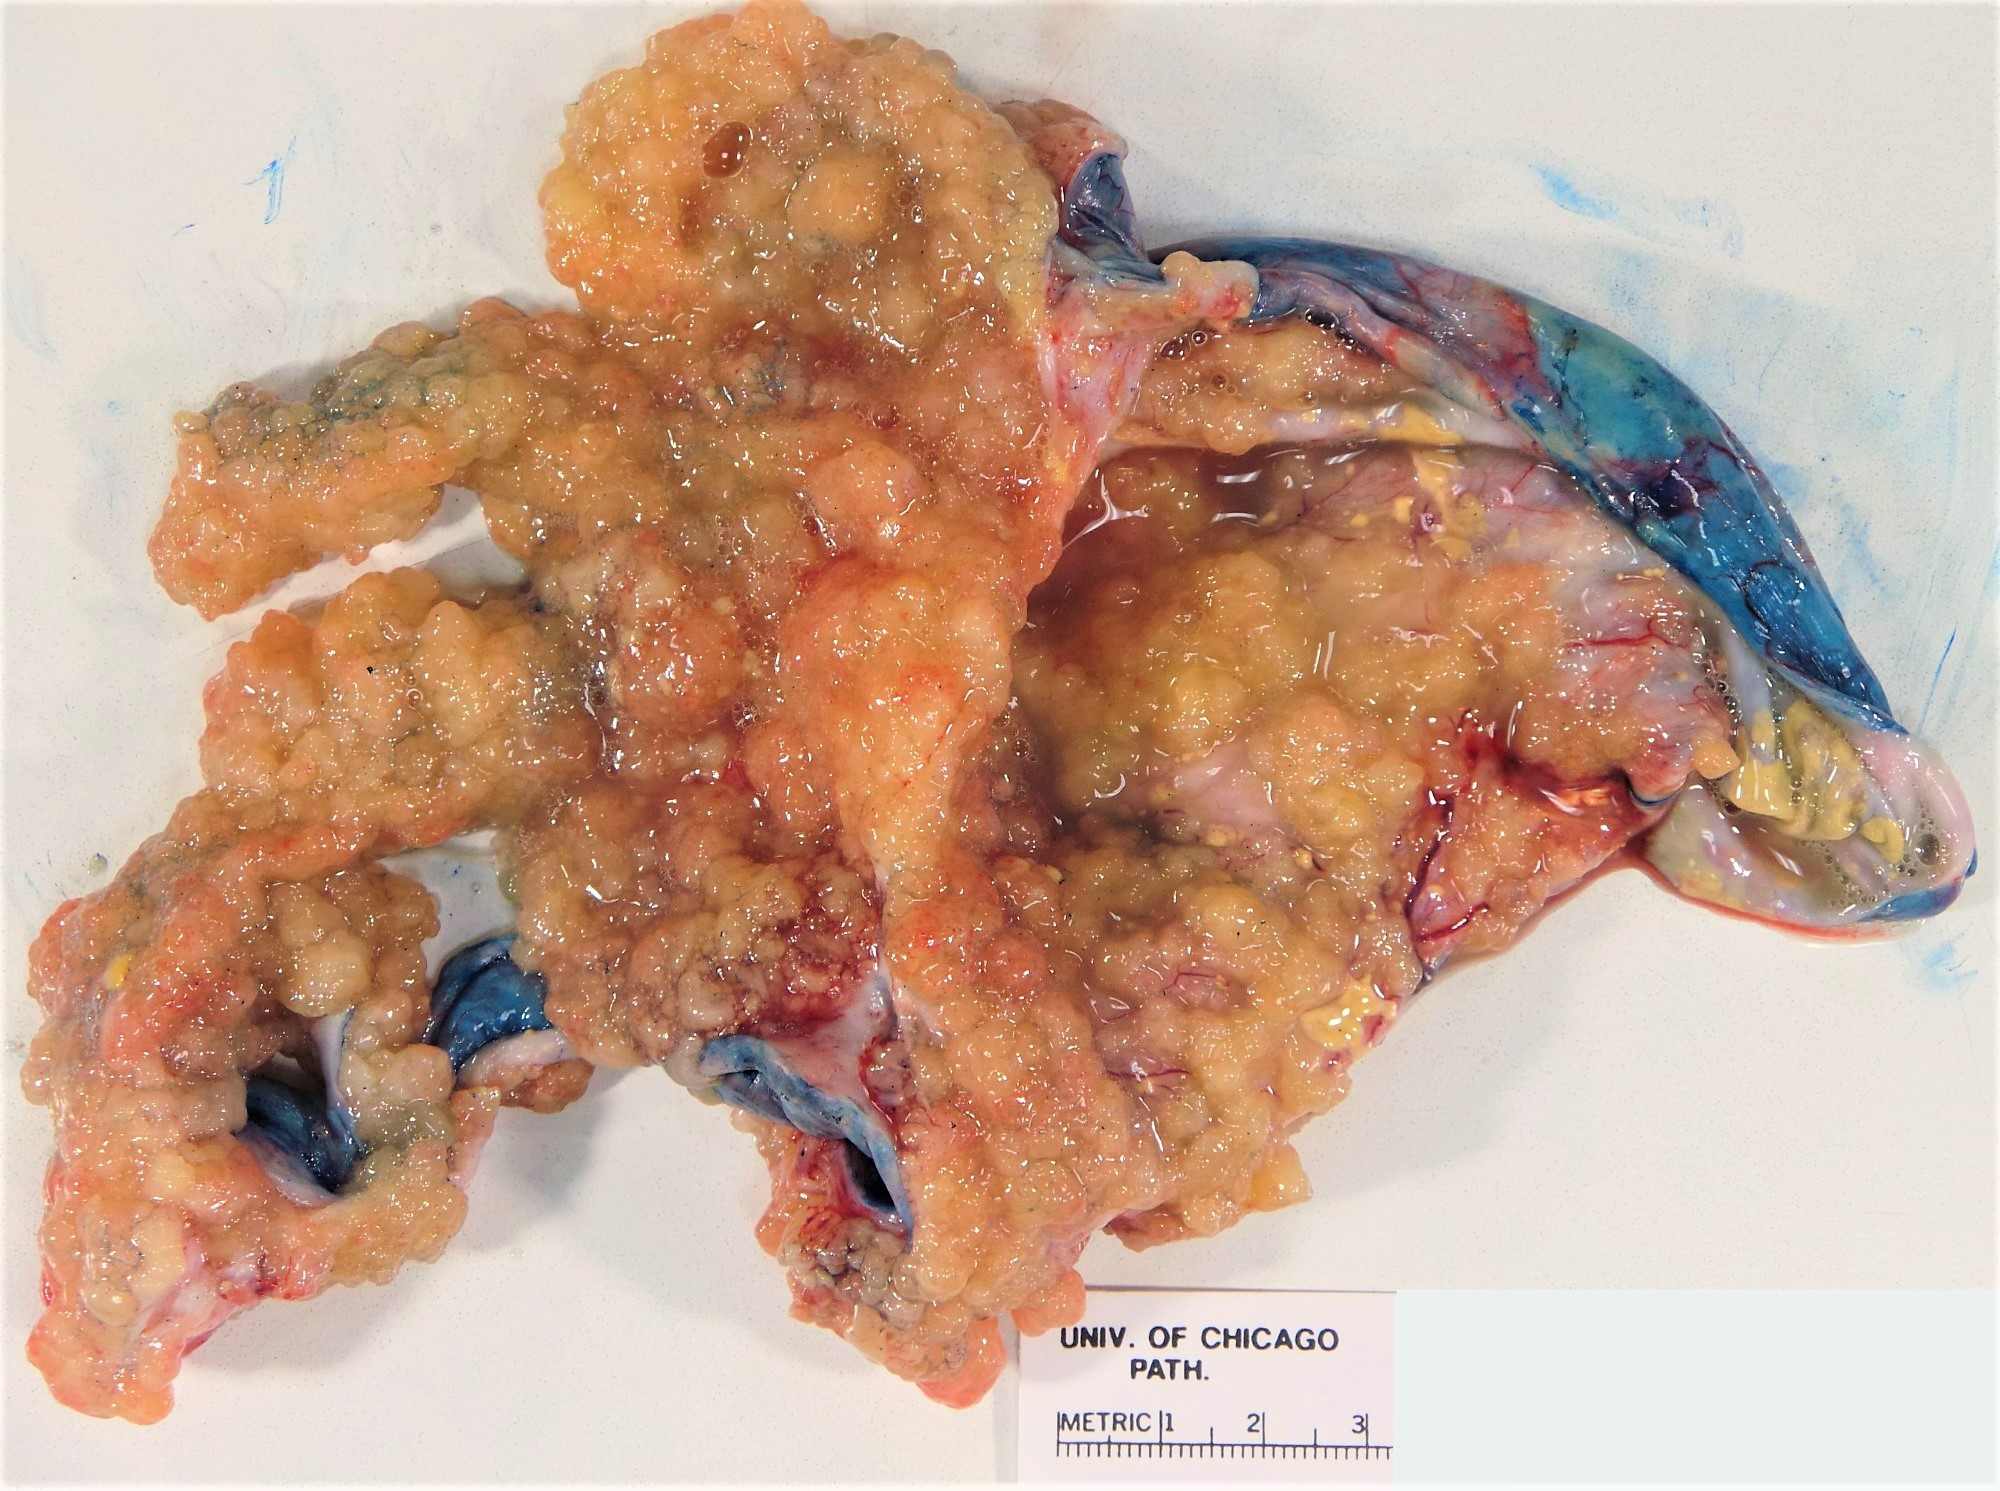 Excrescences inked cyst